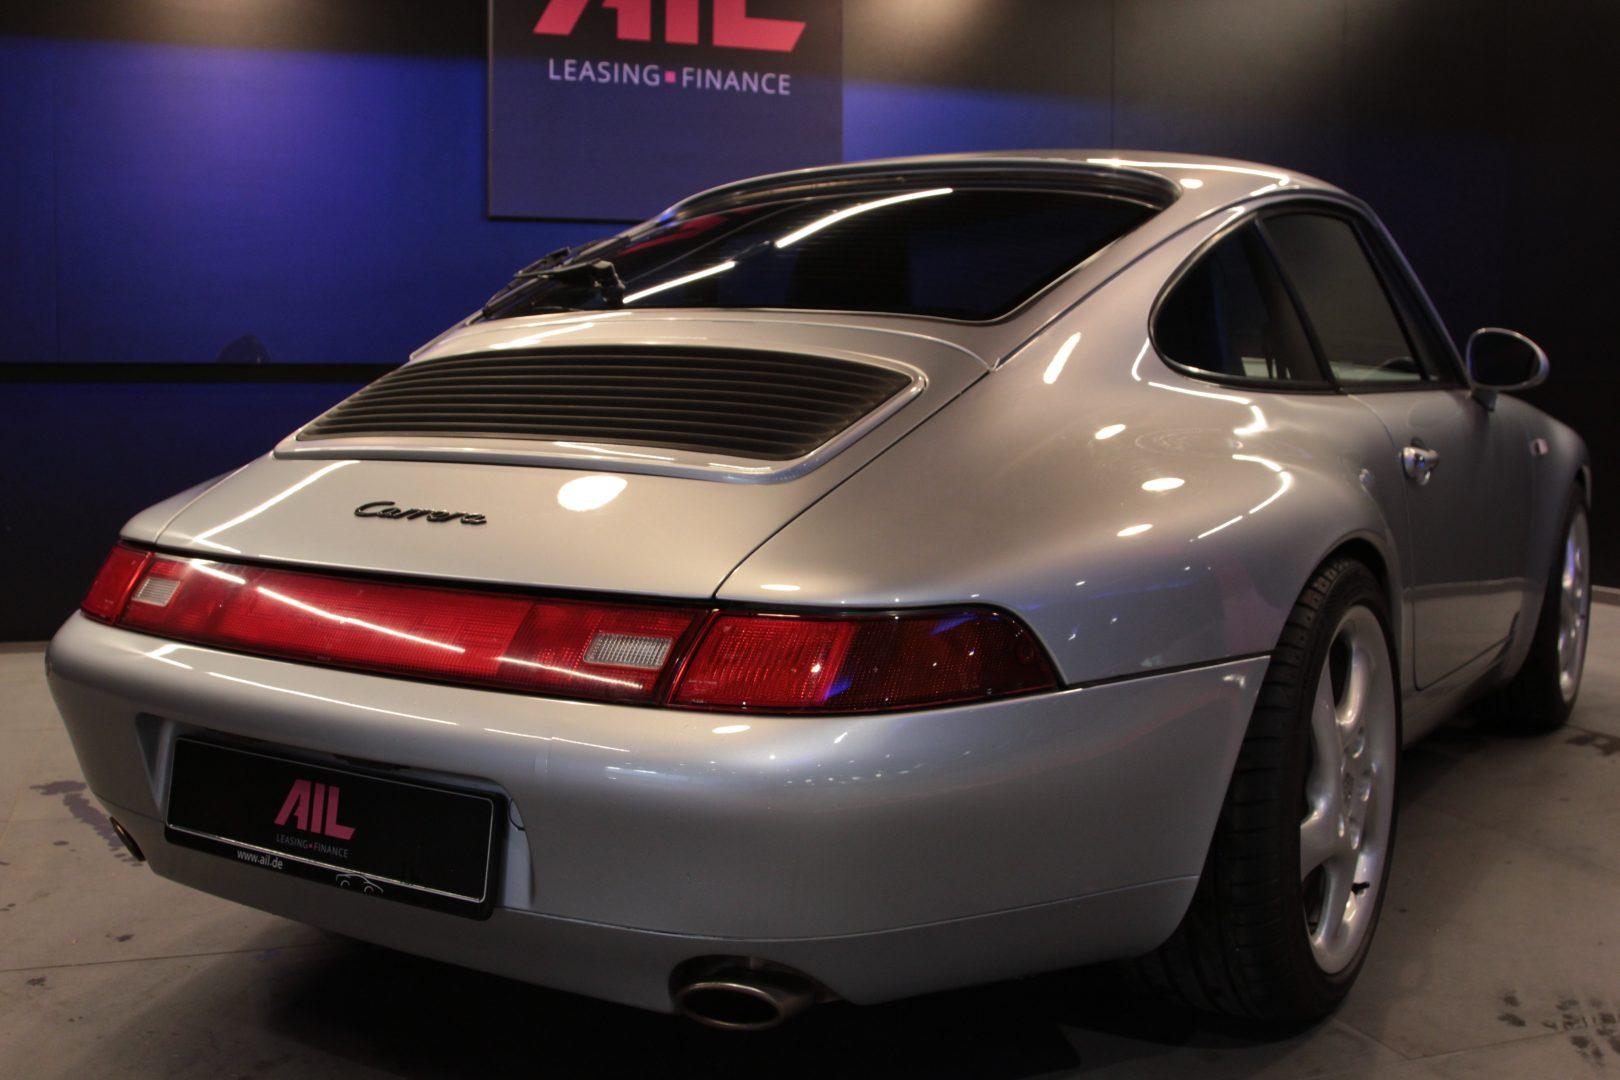 AIL Porsche 993 Carrera C2 3.6 Tiptronic 2